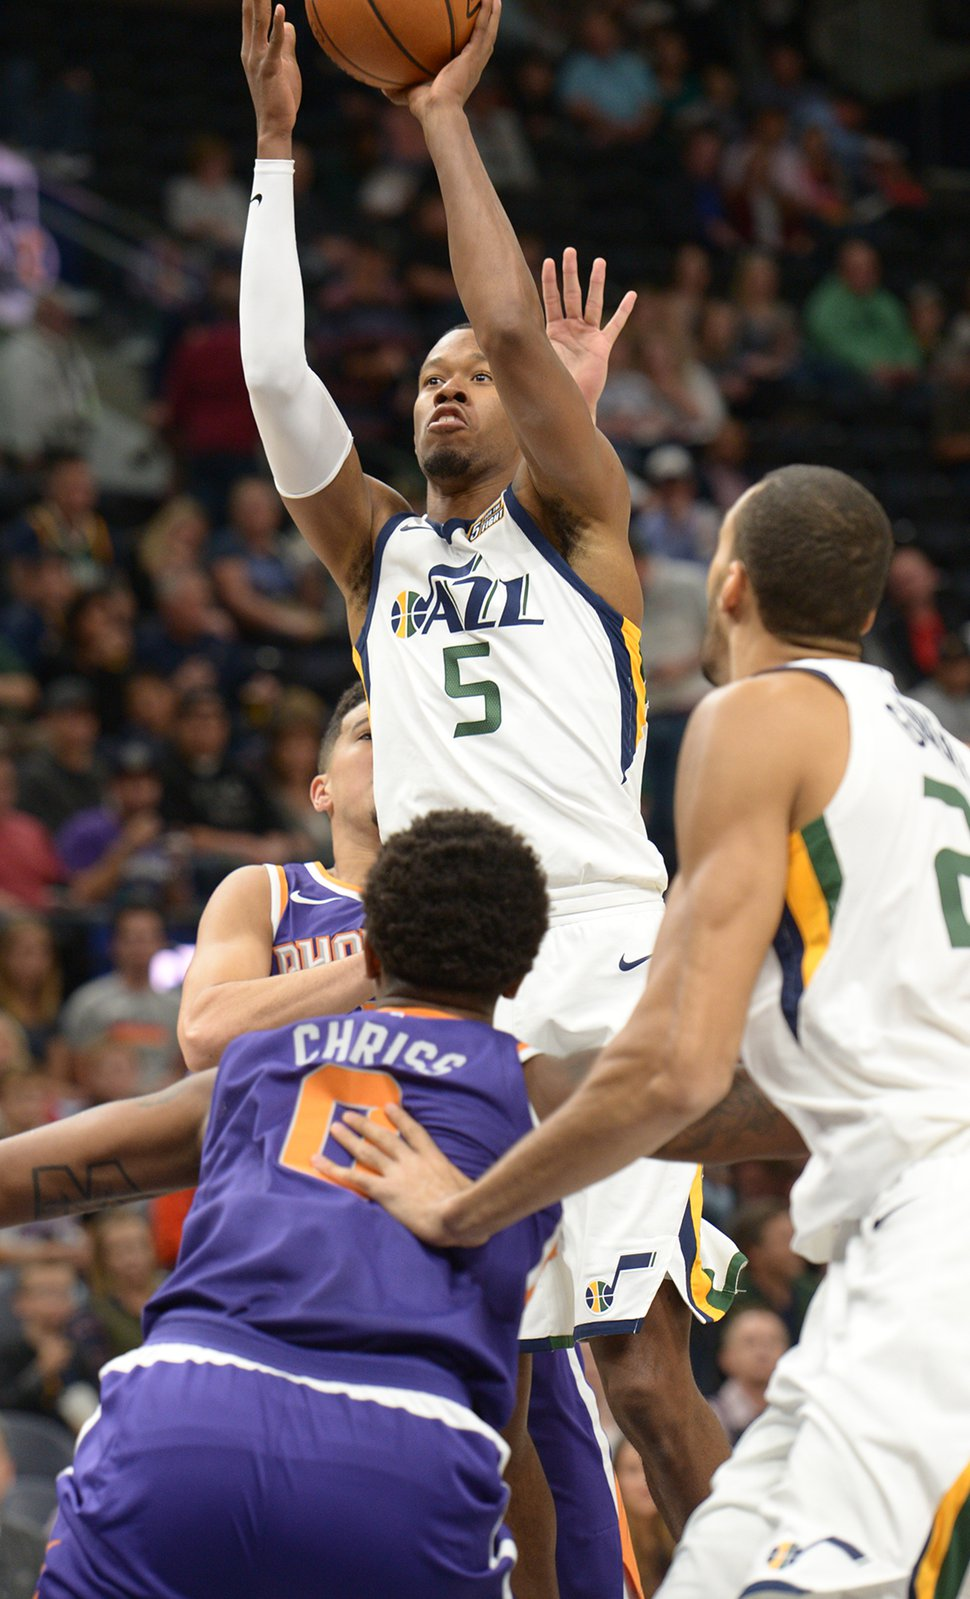 (Leah Hogsten | The Salt Lake Tribune) Utah Jazz guard Rodney Hood (5) shoots over the Phoenix defense. The Utah Jazz defeated the Phoenix Suns 112-101 during preseason NBA basketball at Vivint Smart Home Arena in Salt Lake City, October 6, 2017.